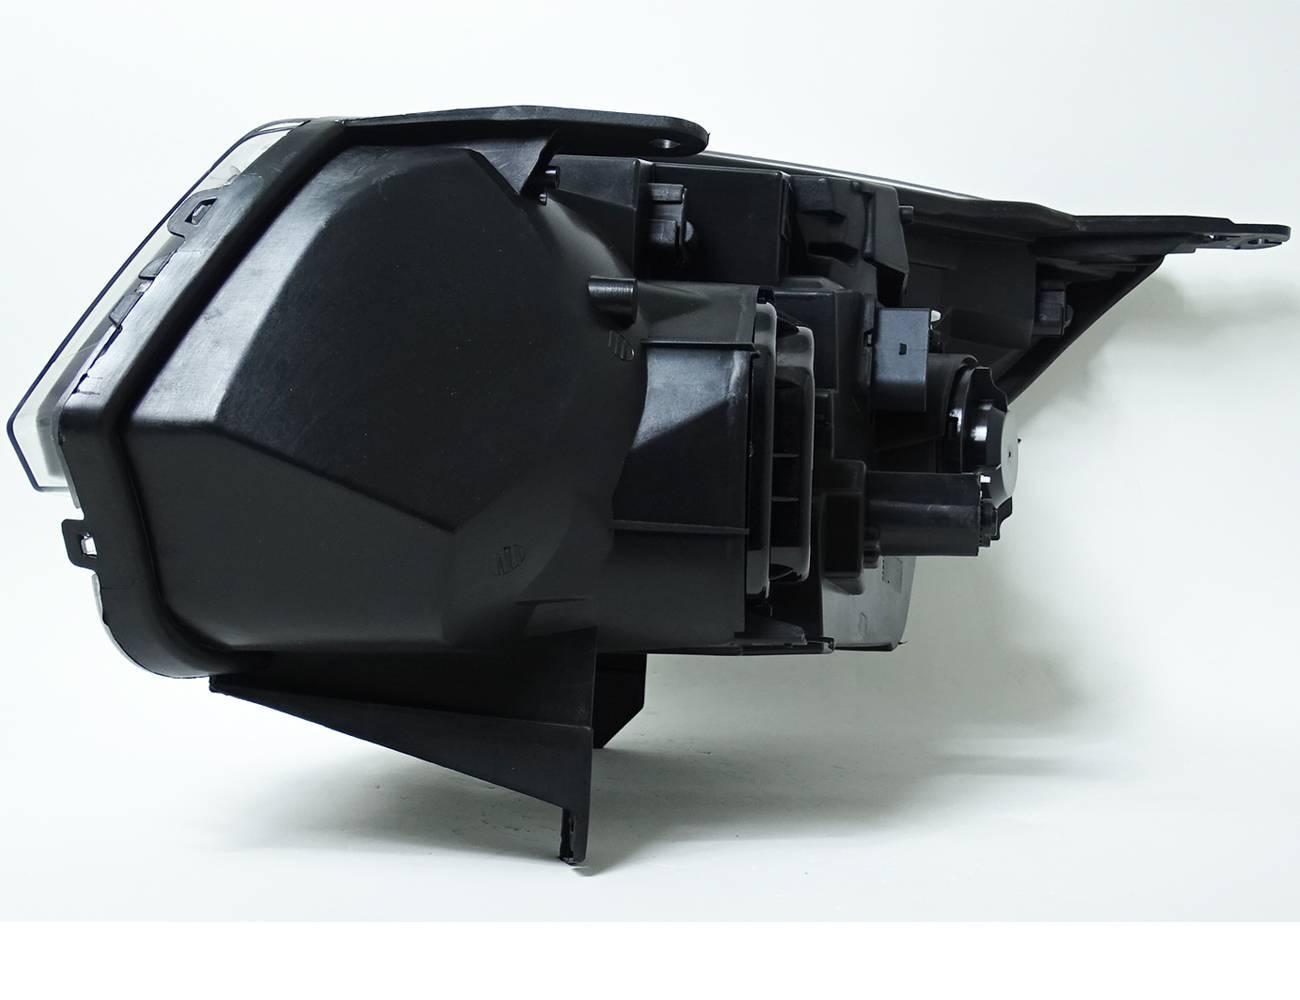 KIT FAROL NOVA S10 2013 A 2016 MASCARA NEGRA LD + LE FLY - Sul Acessorios